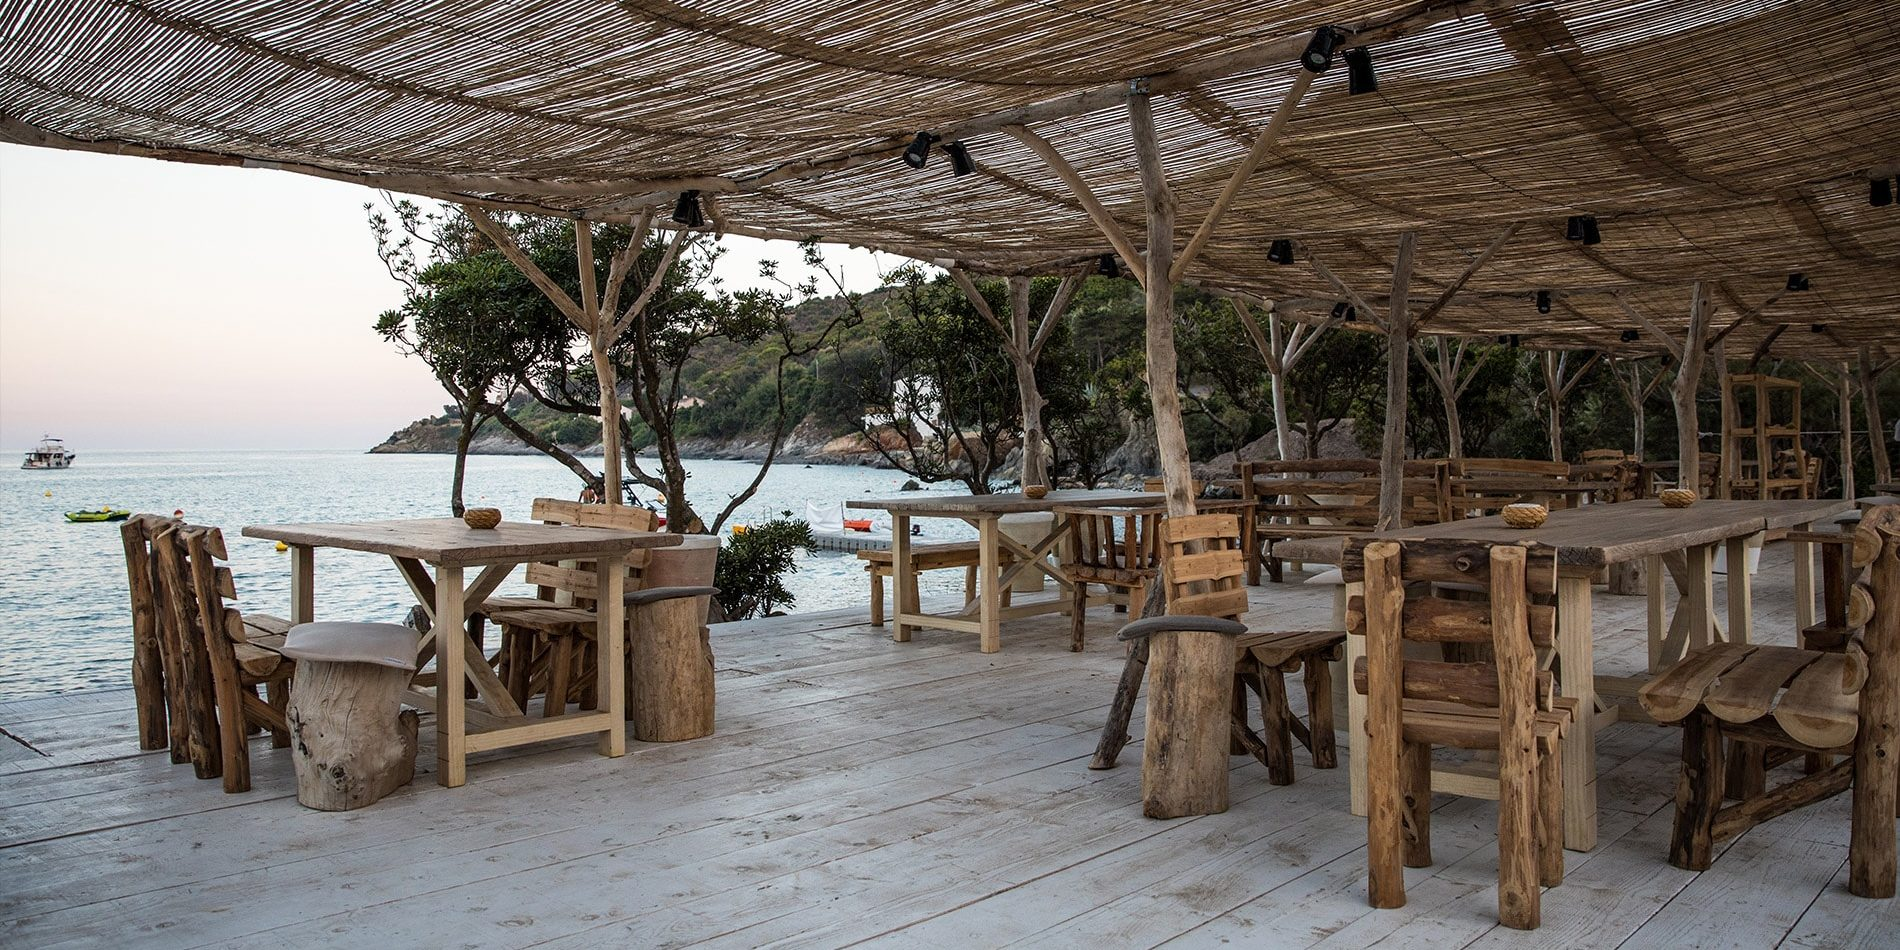 Hotel Misincu Cagnano Cap Corse Corsica Frankrijk beach club terras zonwering zonsondergang